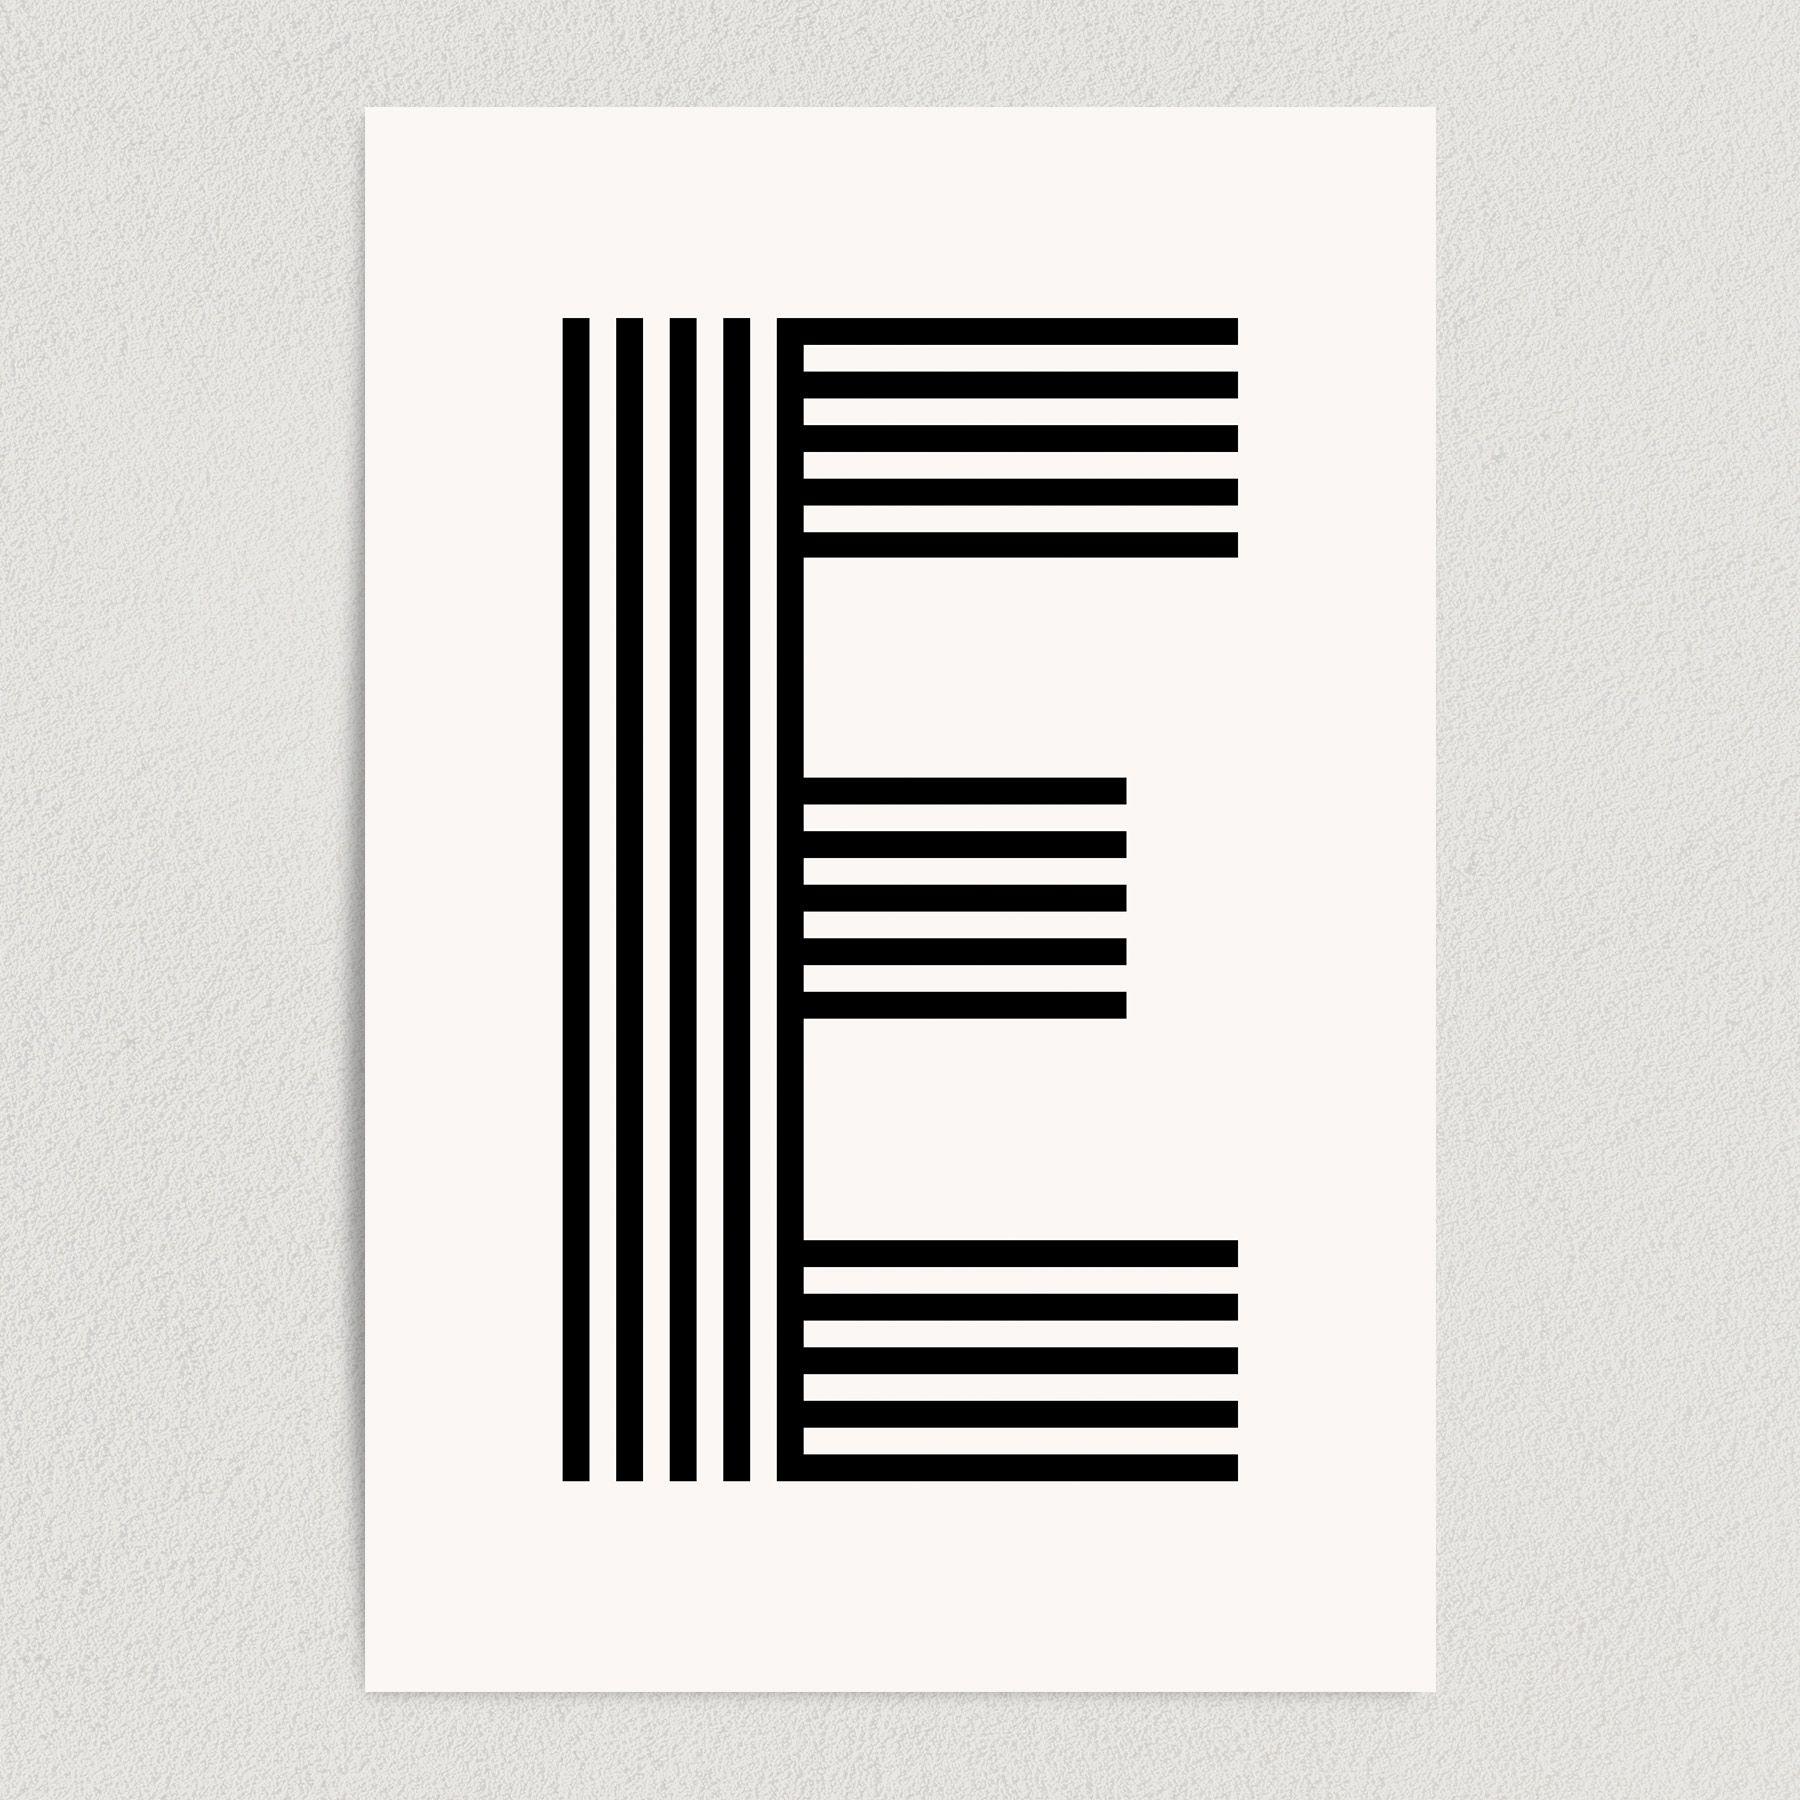 Letter E Modern Typography Art Print Poster 12″ x 18″ Wall Art M2164